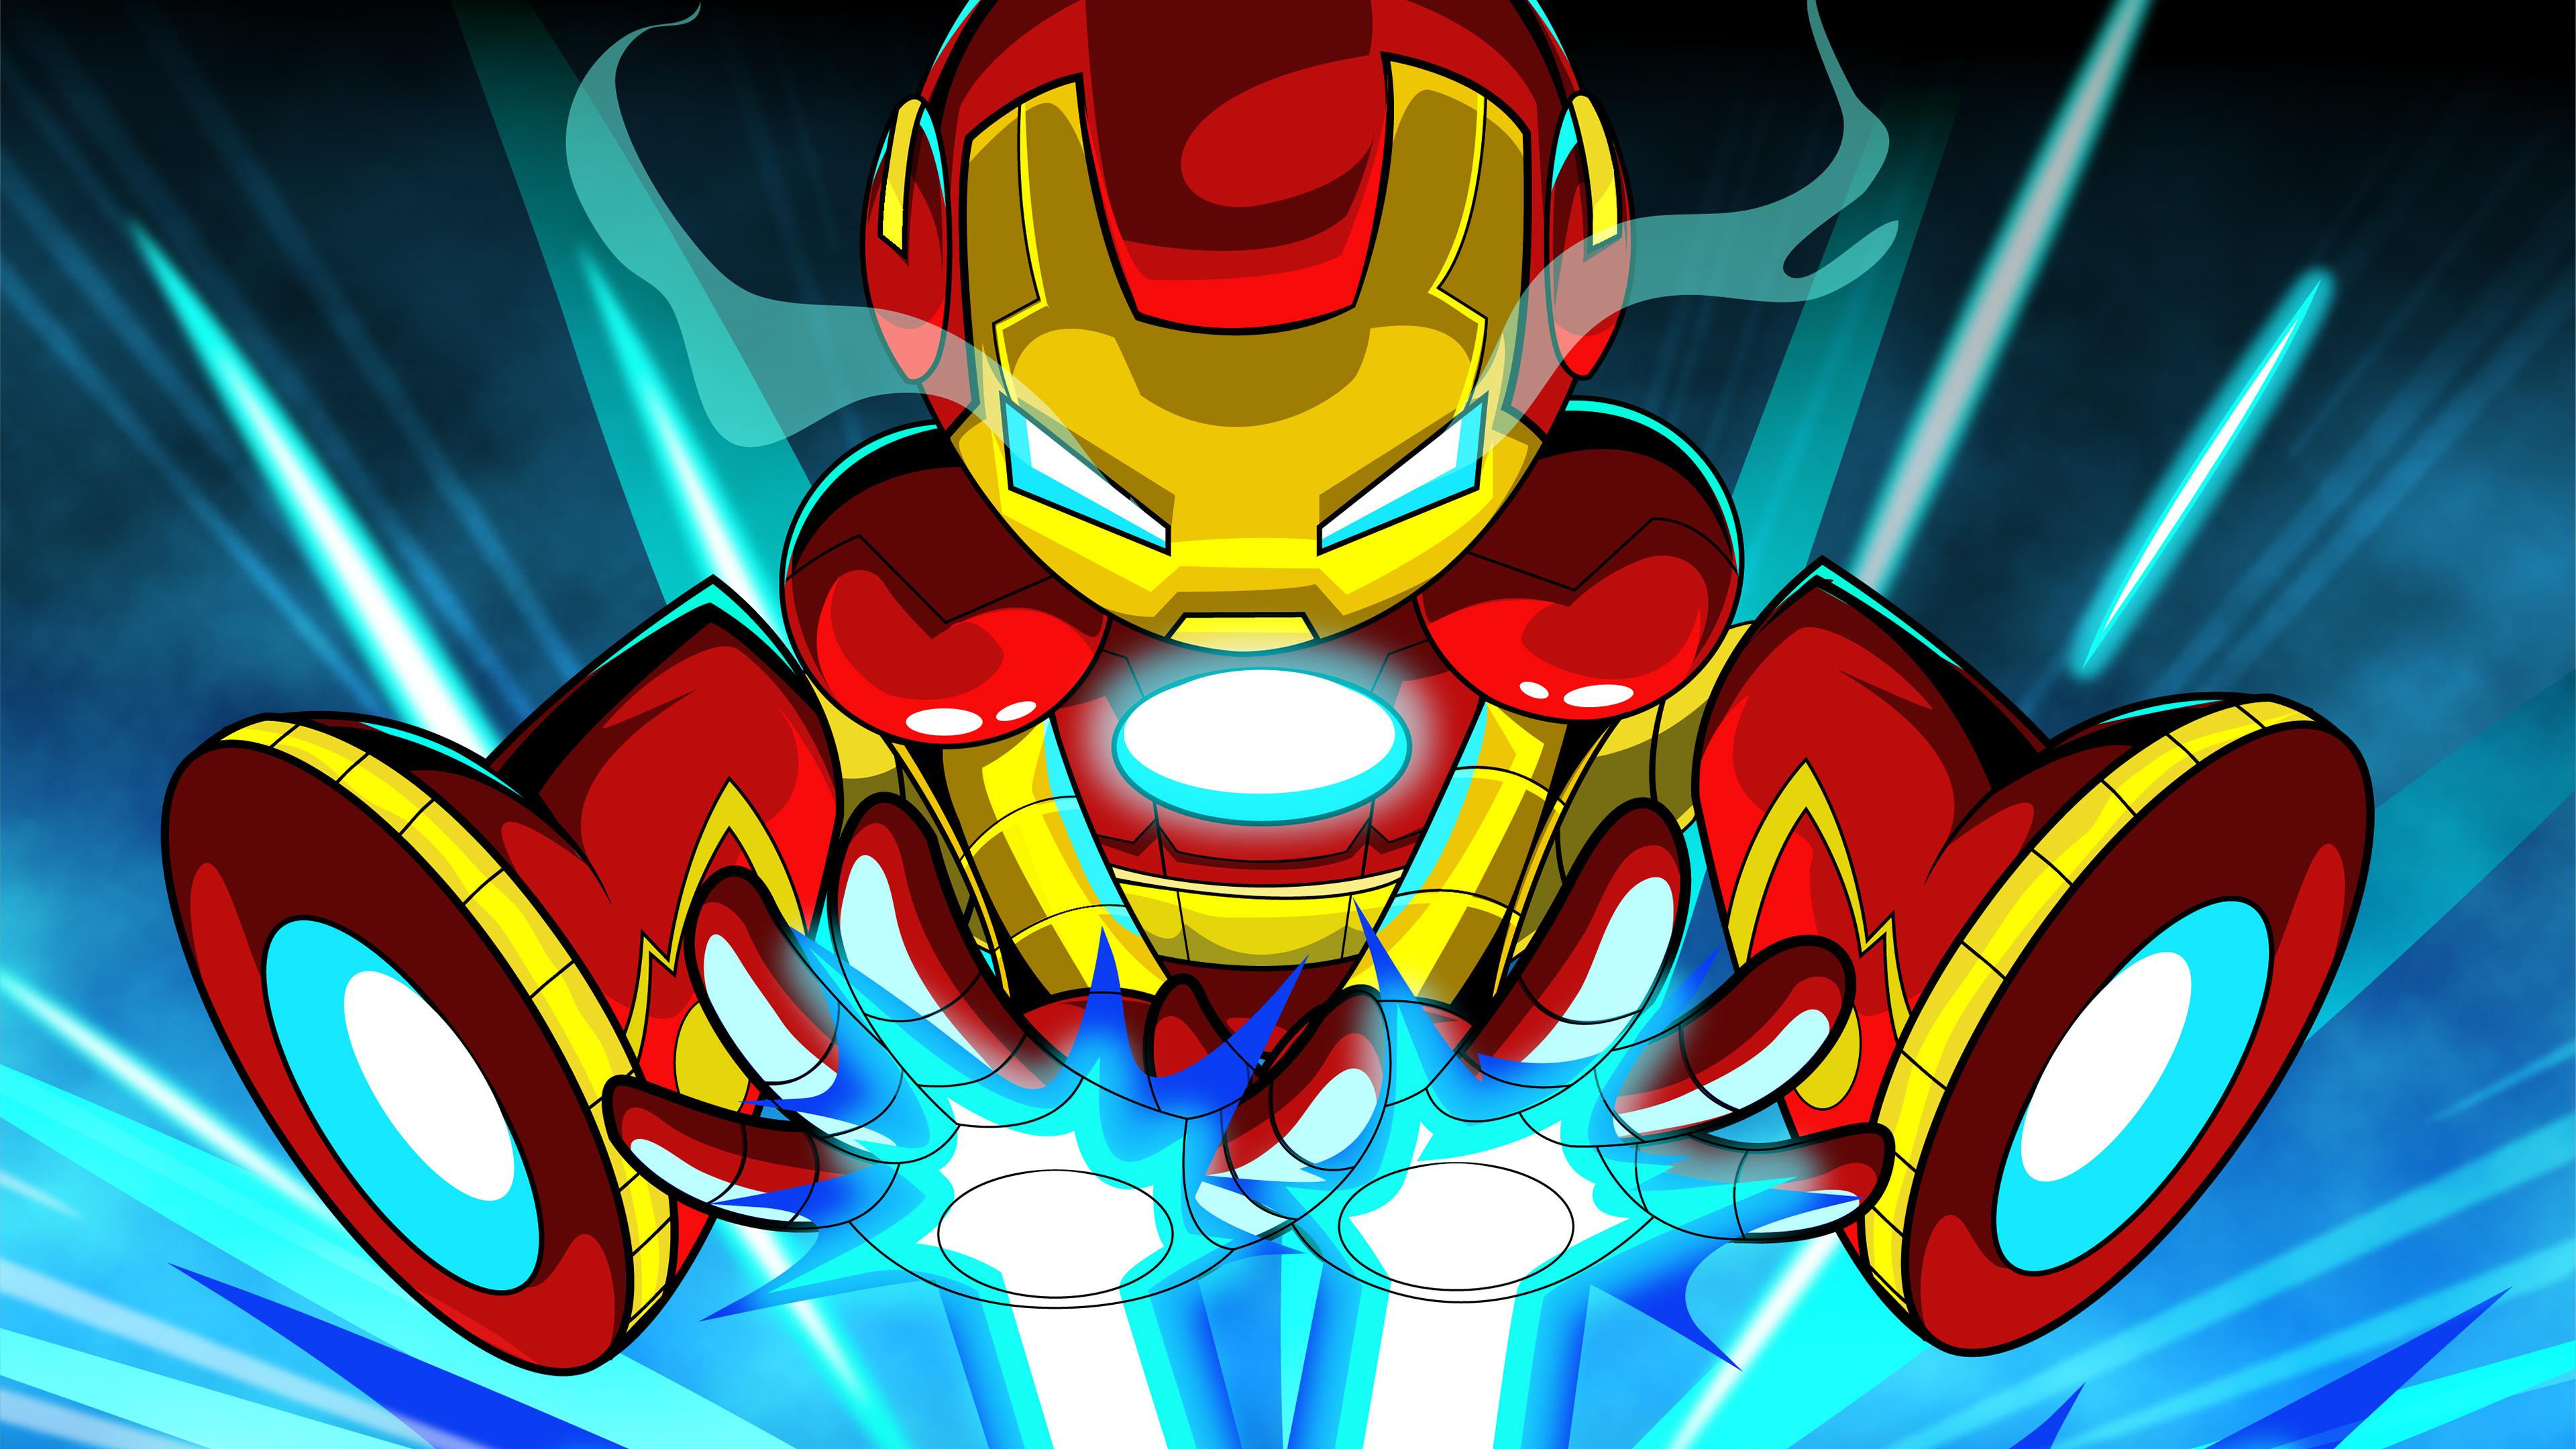 iron man cartoon digital art 4k 1536523931 - Iron Man Cartoon Digital Art 4k - superheroes wallpapers, iron man wallpapers, hd-wallpapers, digital art wallpapers, cartoon wallpapers, behance wallpapers, artwork wallpapers, artist wallpapers, 4k-wallpapers